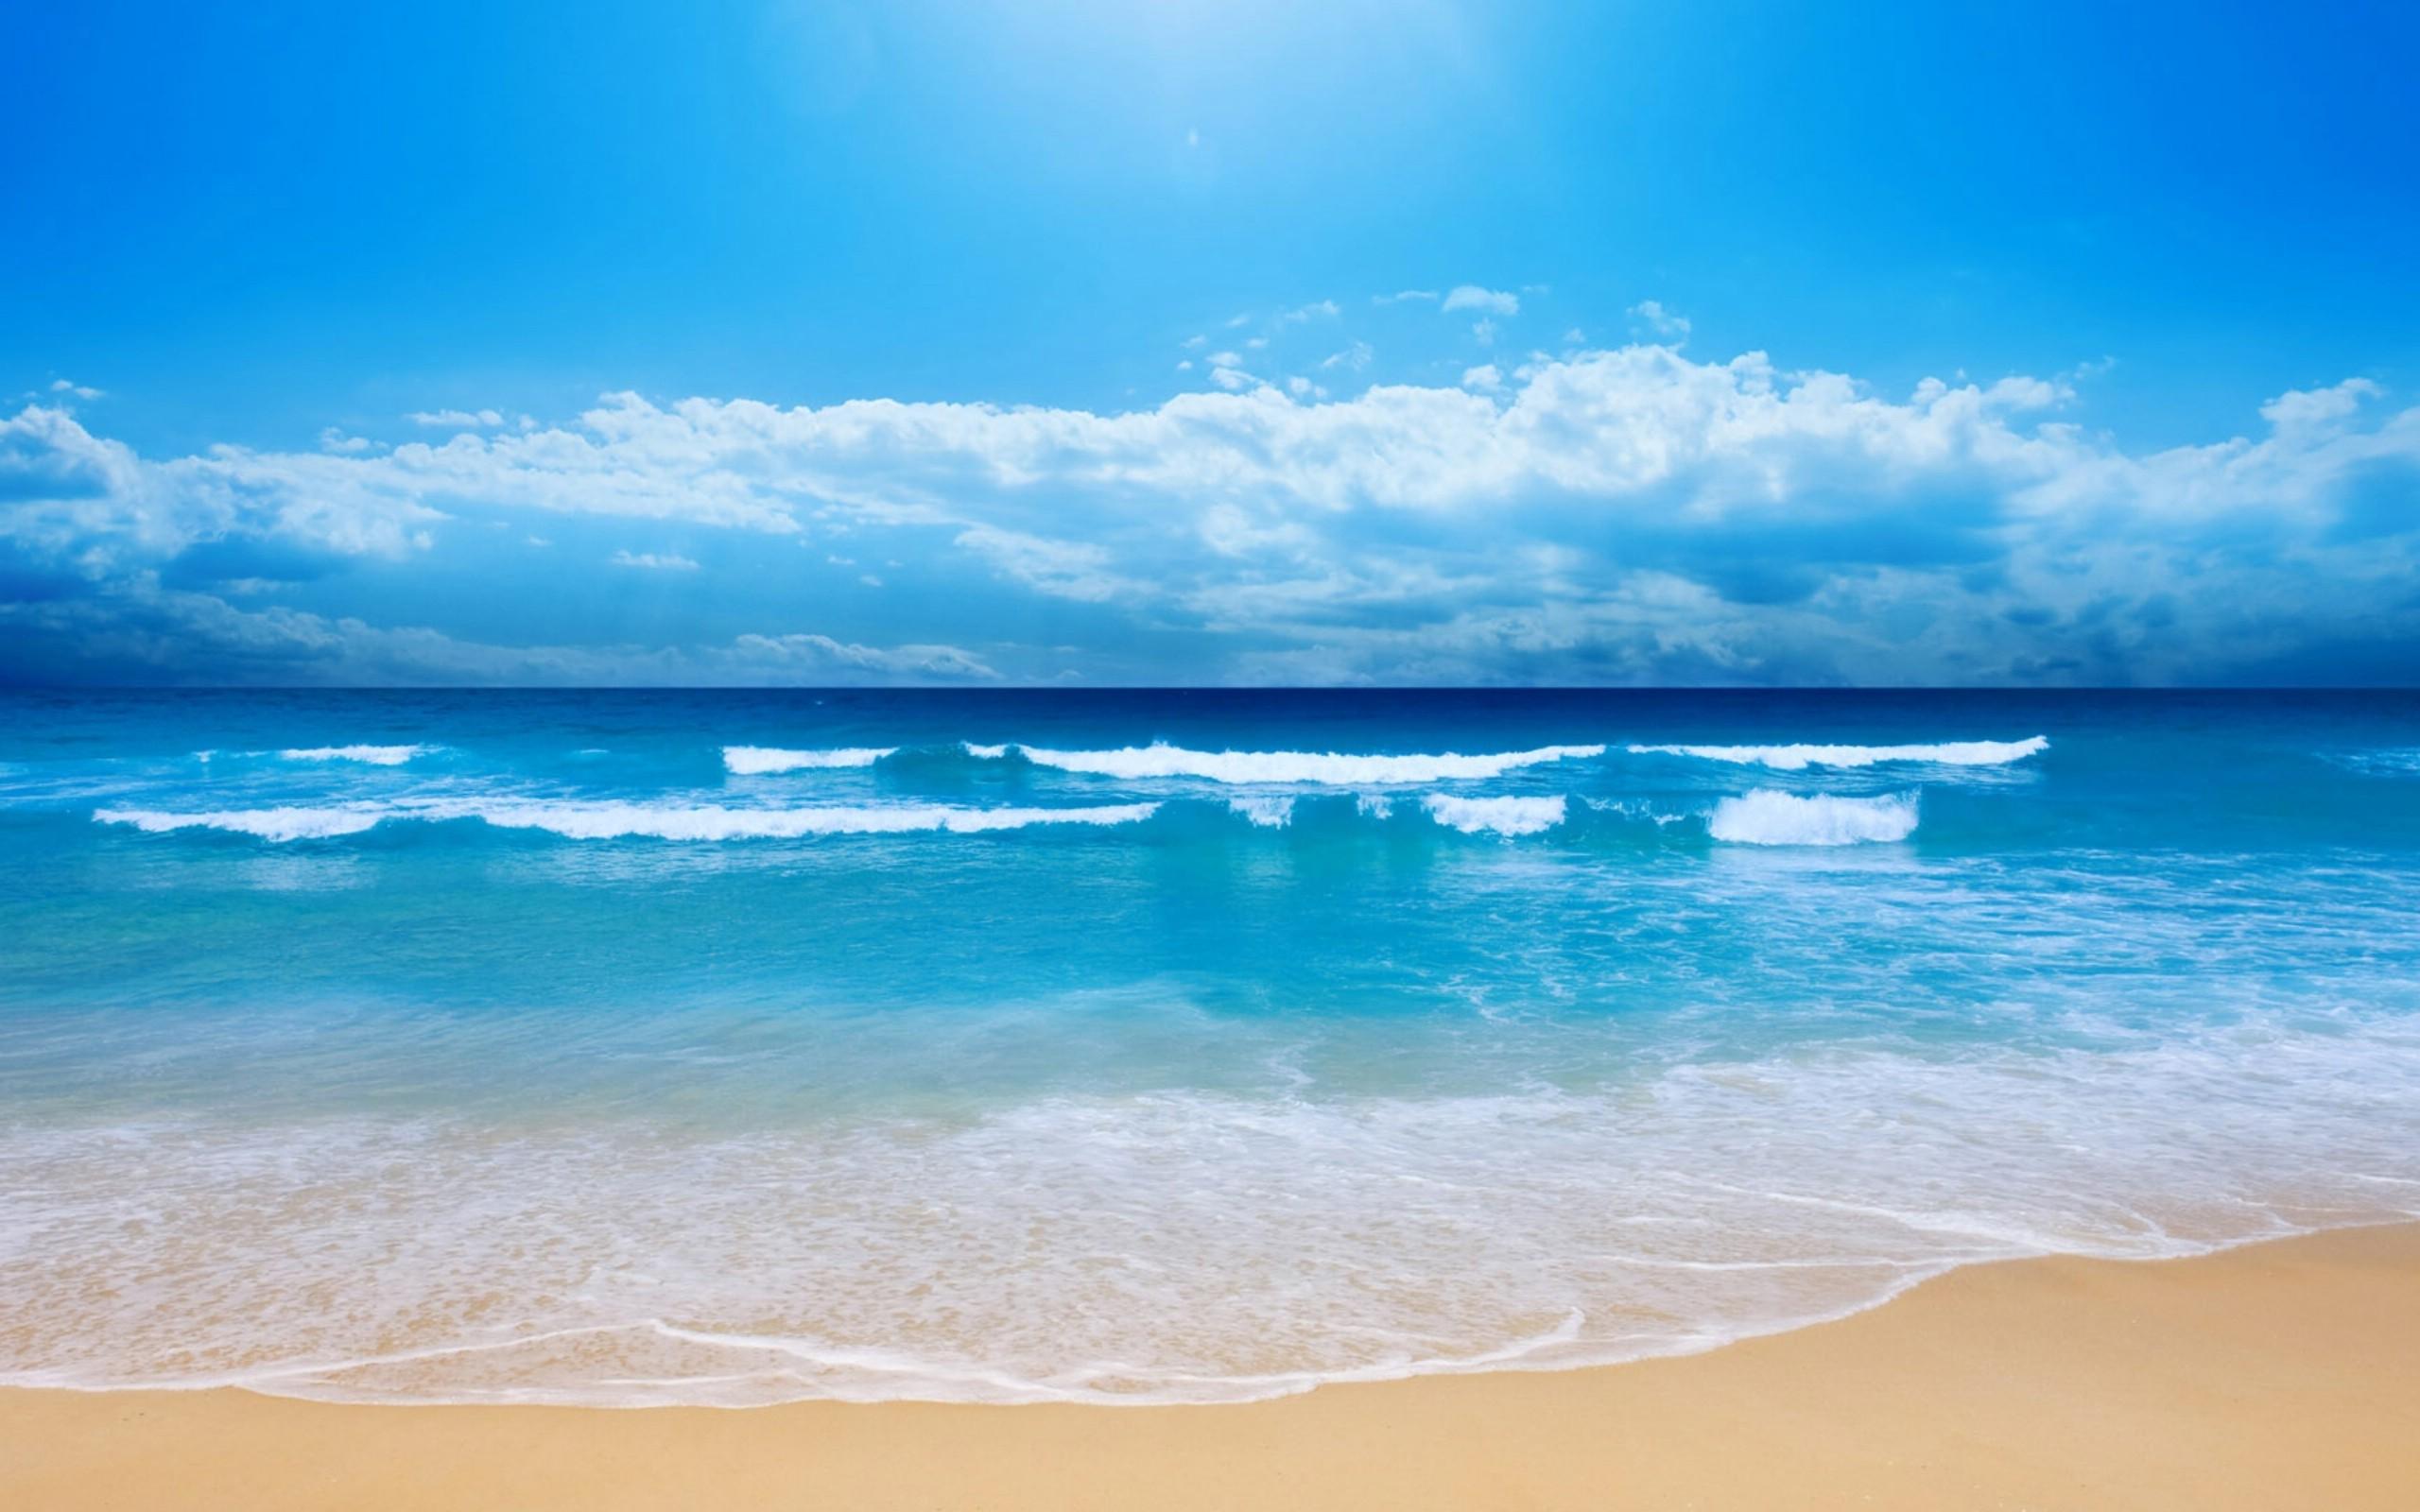 Blue Ocean Wallpaper 2560x1600 Blue Ocean Clouds Landscapes Nature 2560x1600